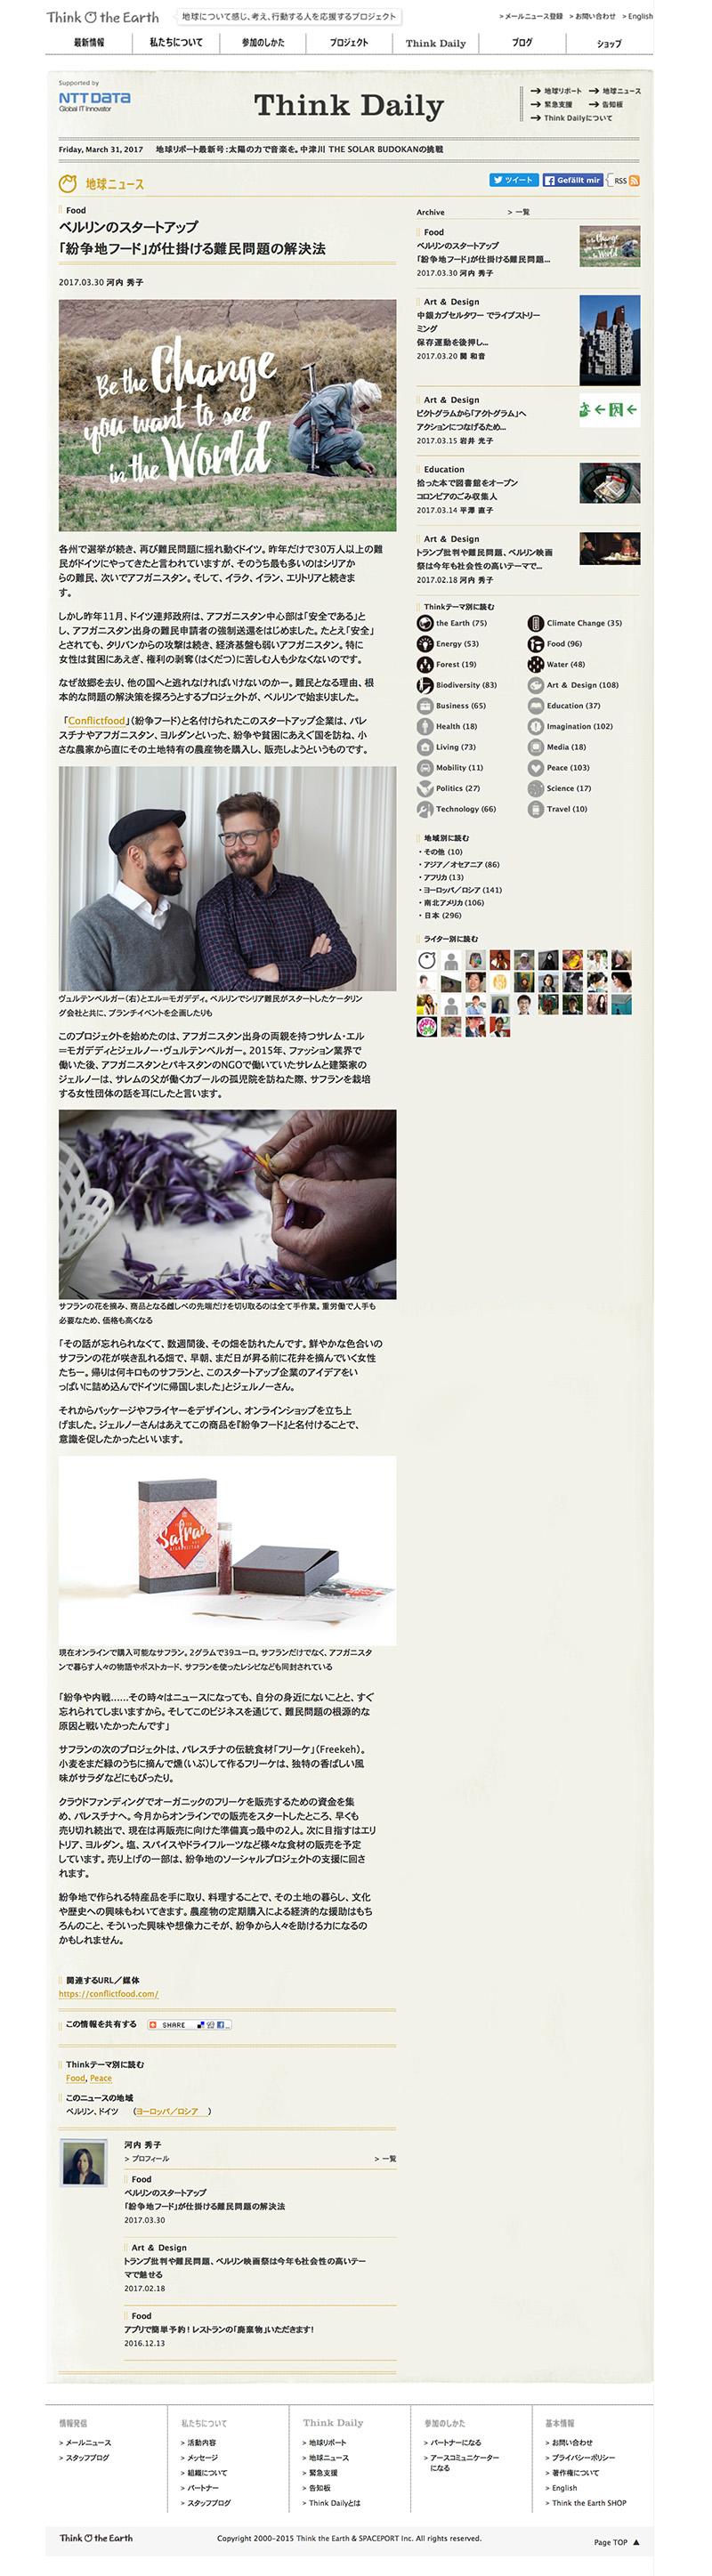 conflictfood_japan_klein